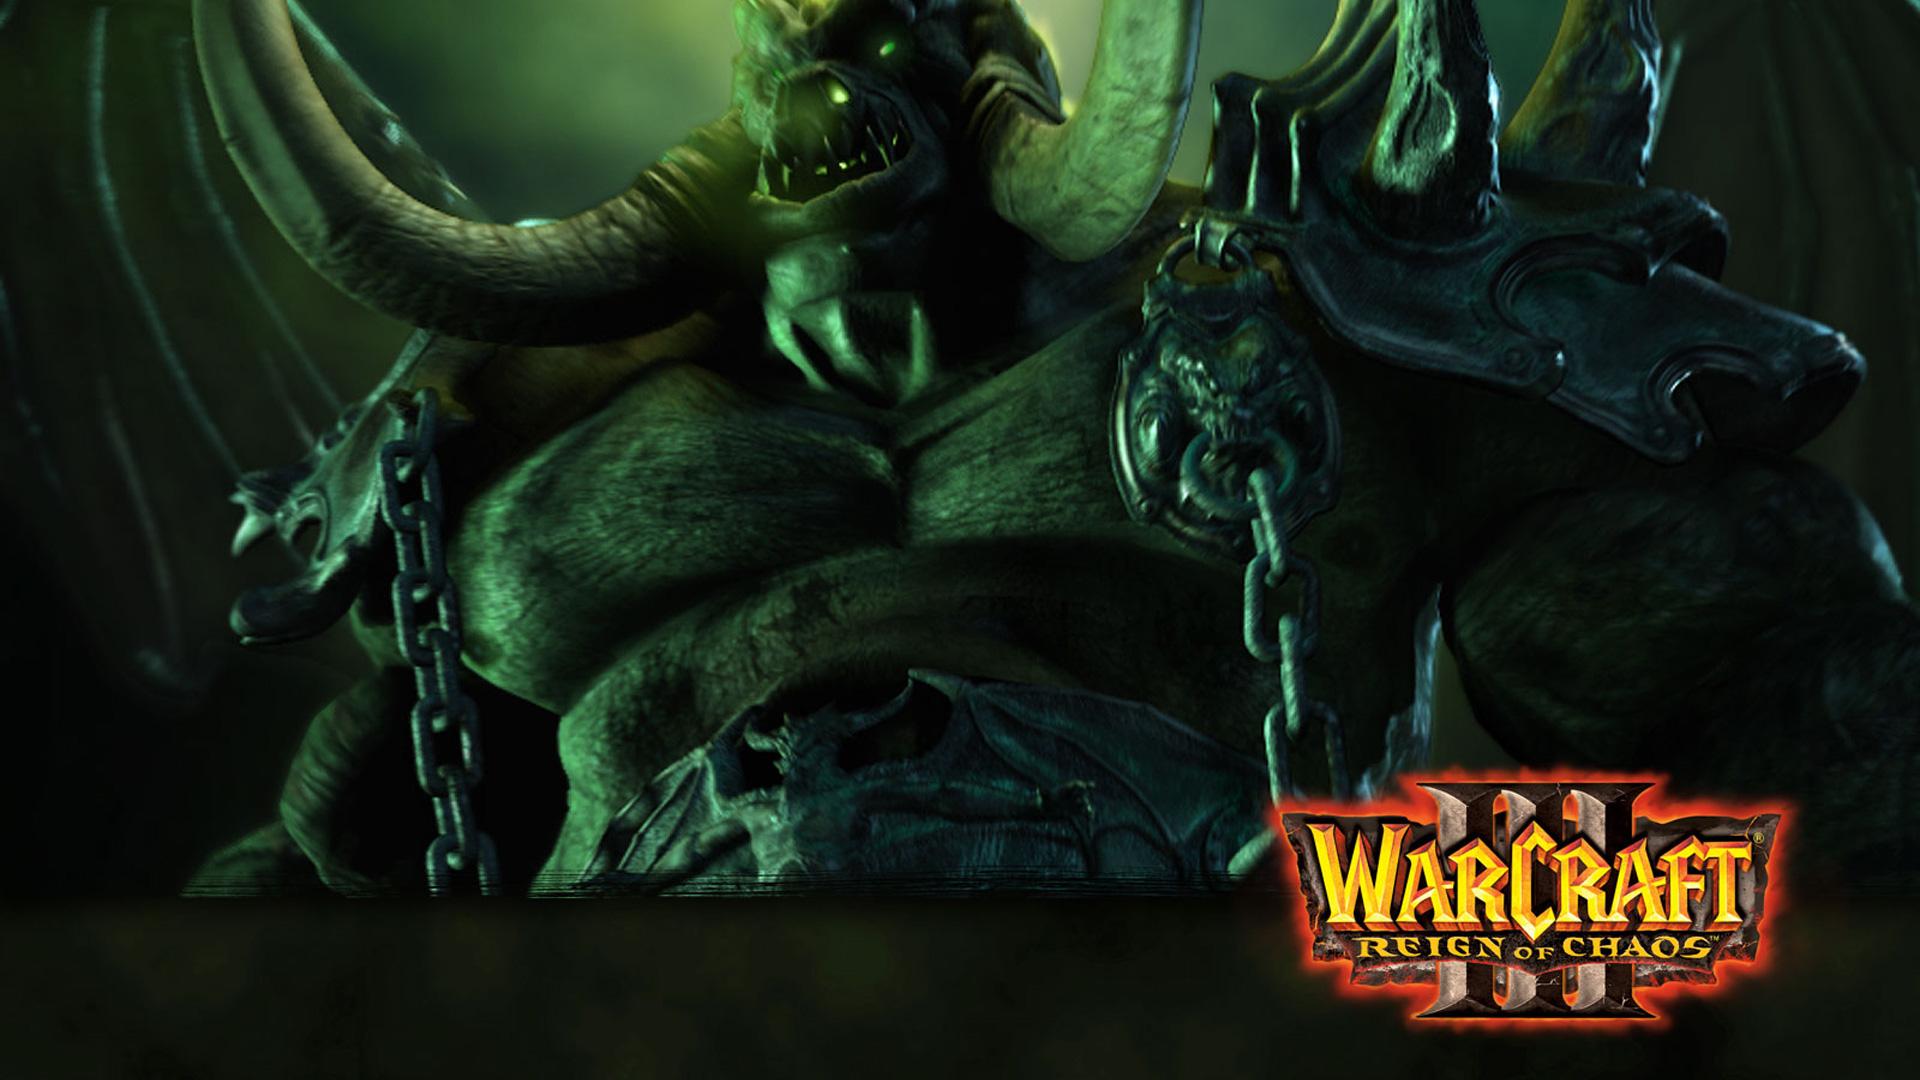 Warcraft 3 wallpaper 3